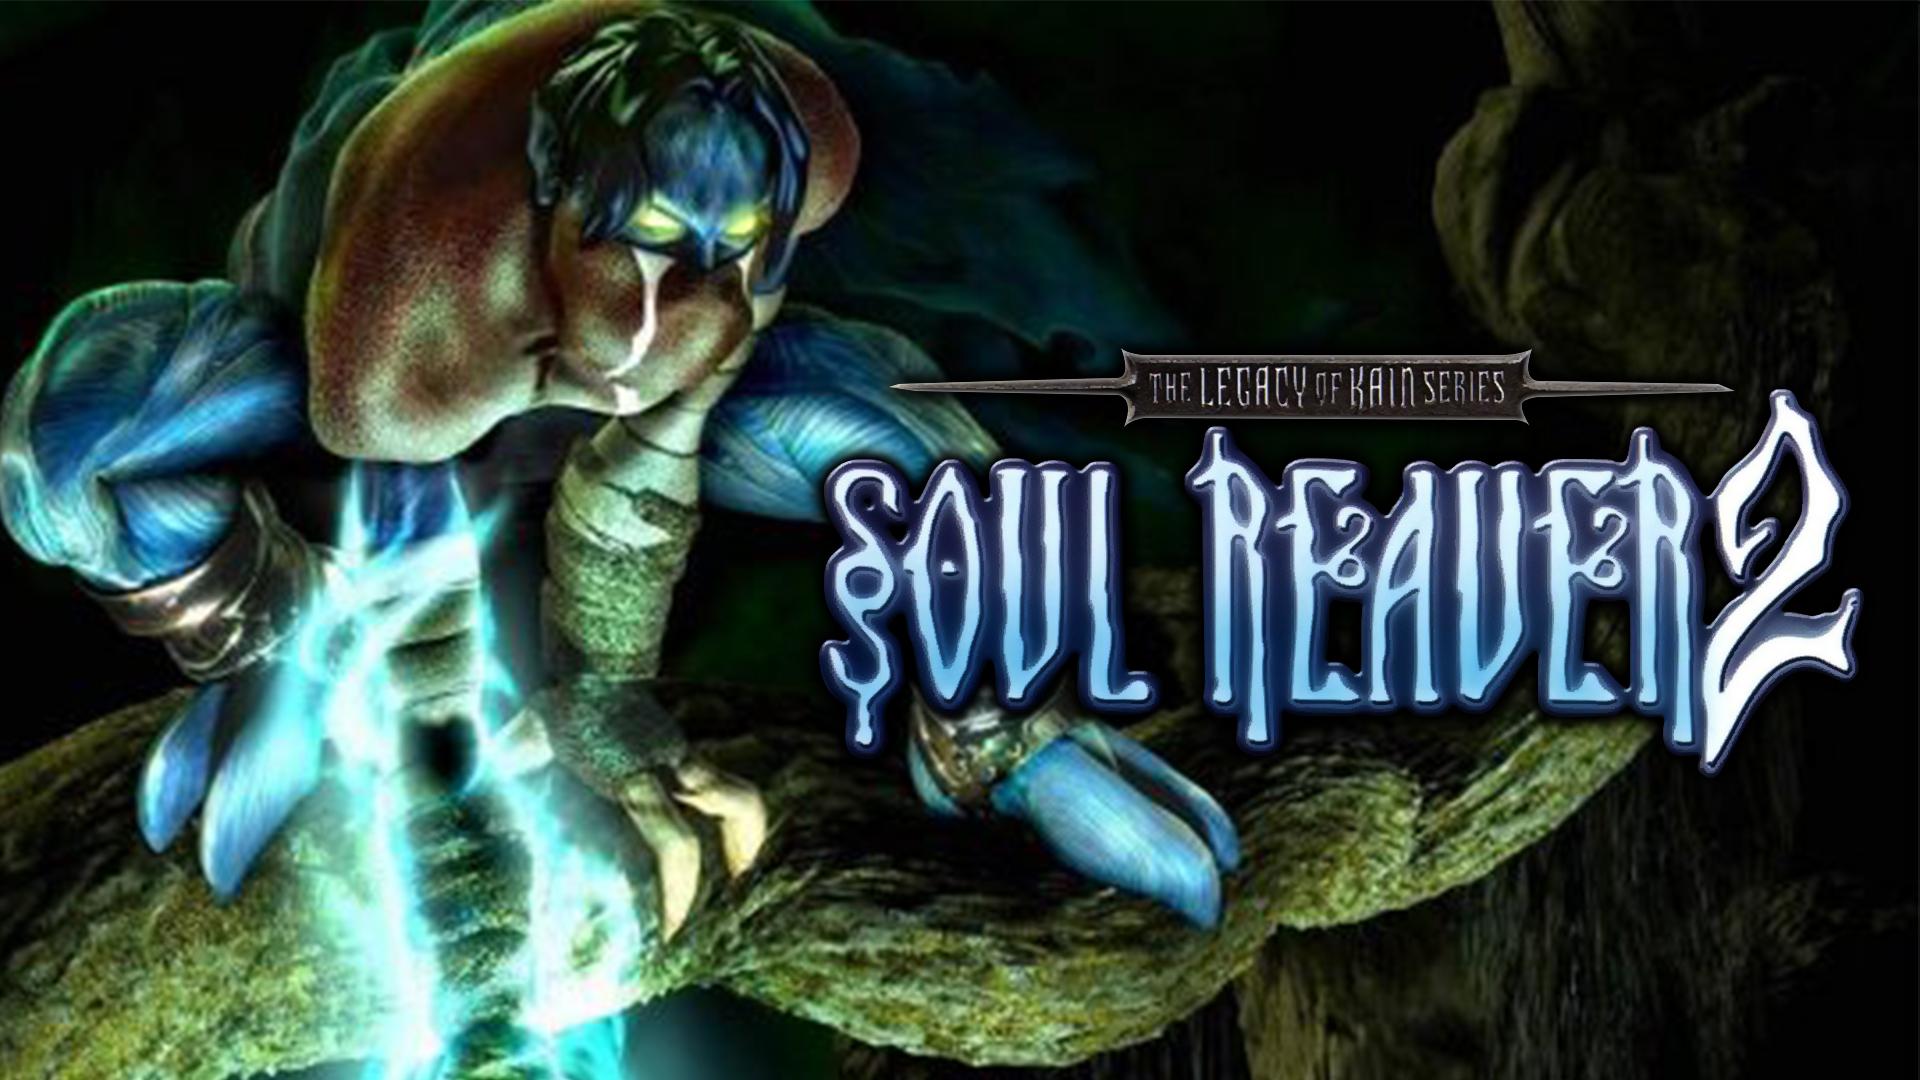 LEGACY OF KAIN SOUL REAVER 2 (PC)